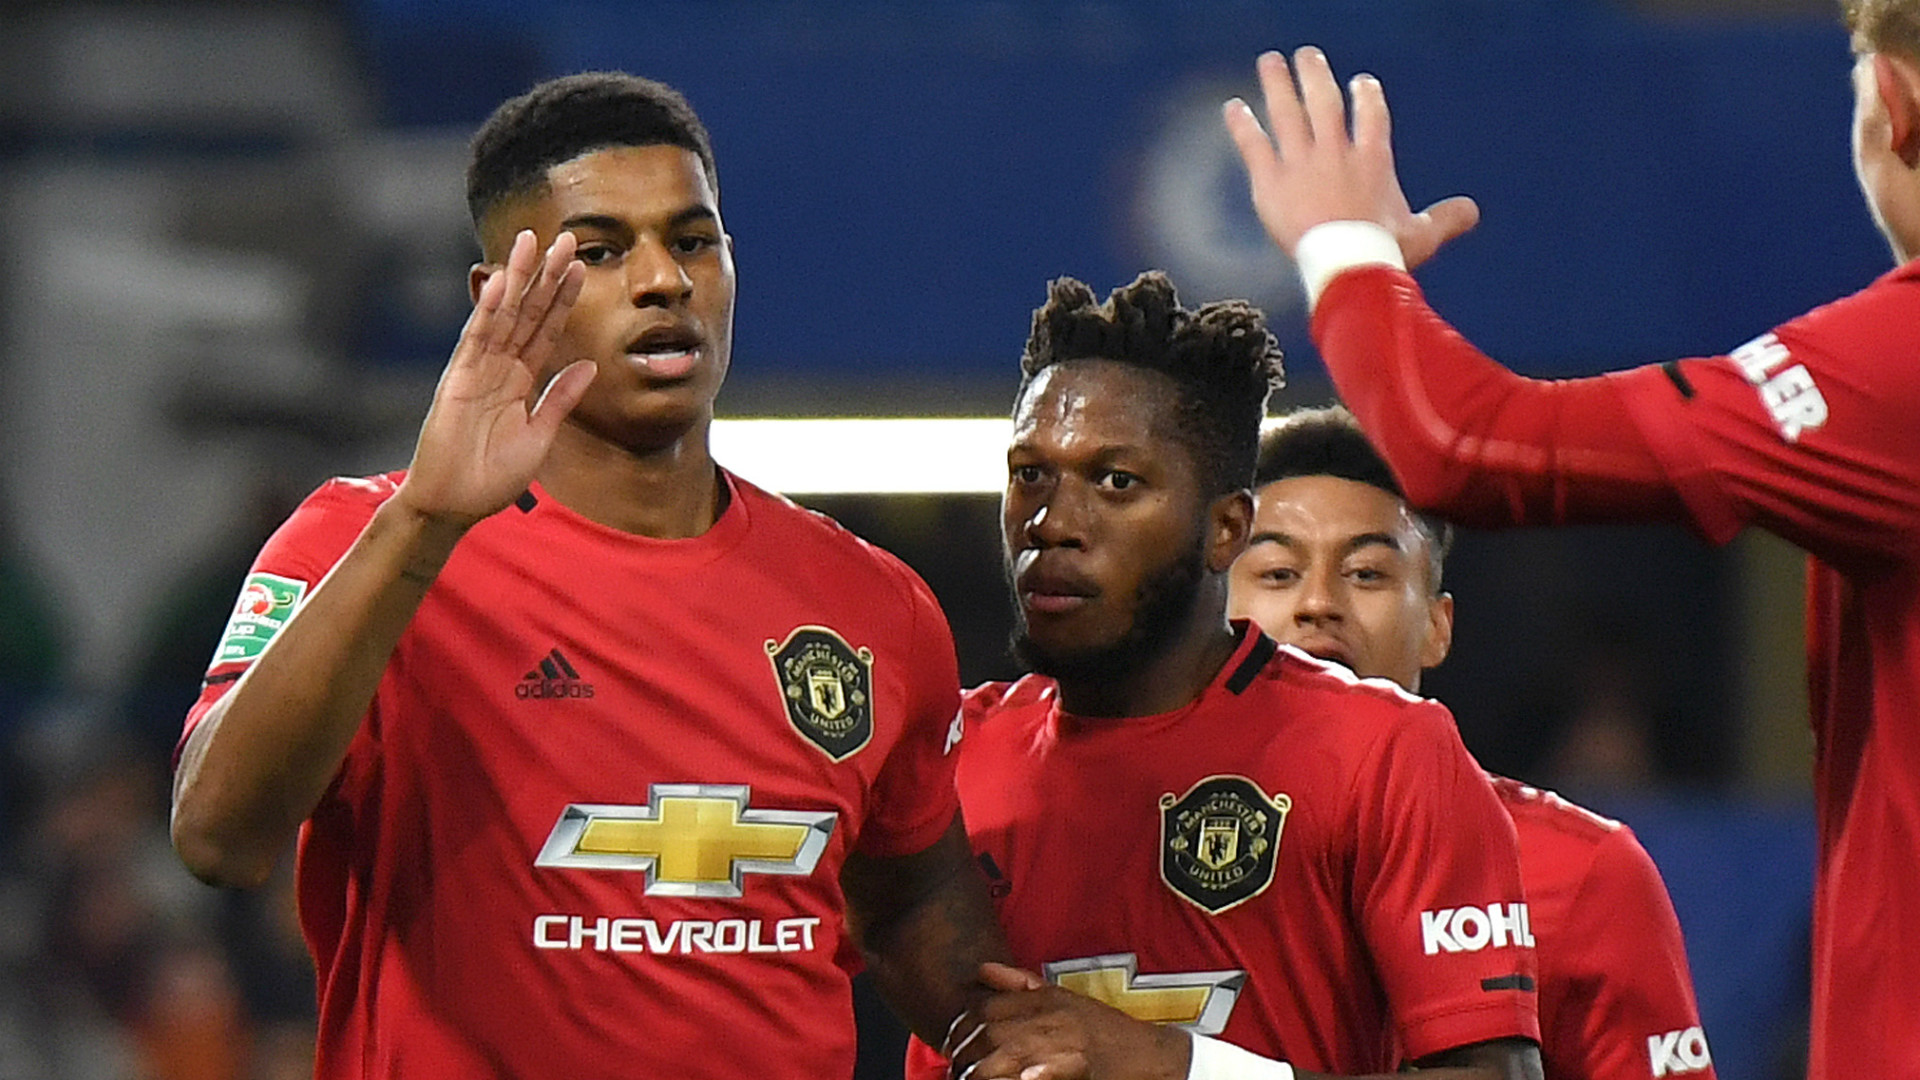 Laporan Pertandingan Chelsea 1 2 Manchester United